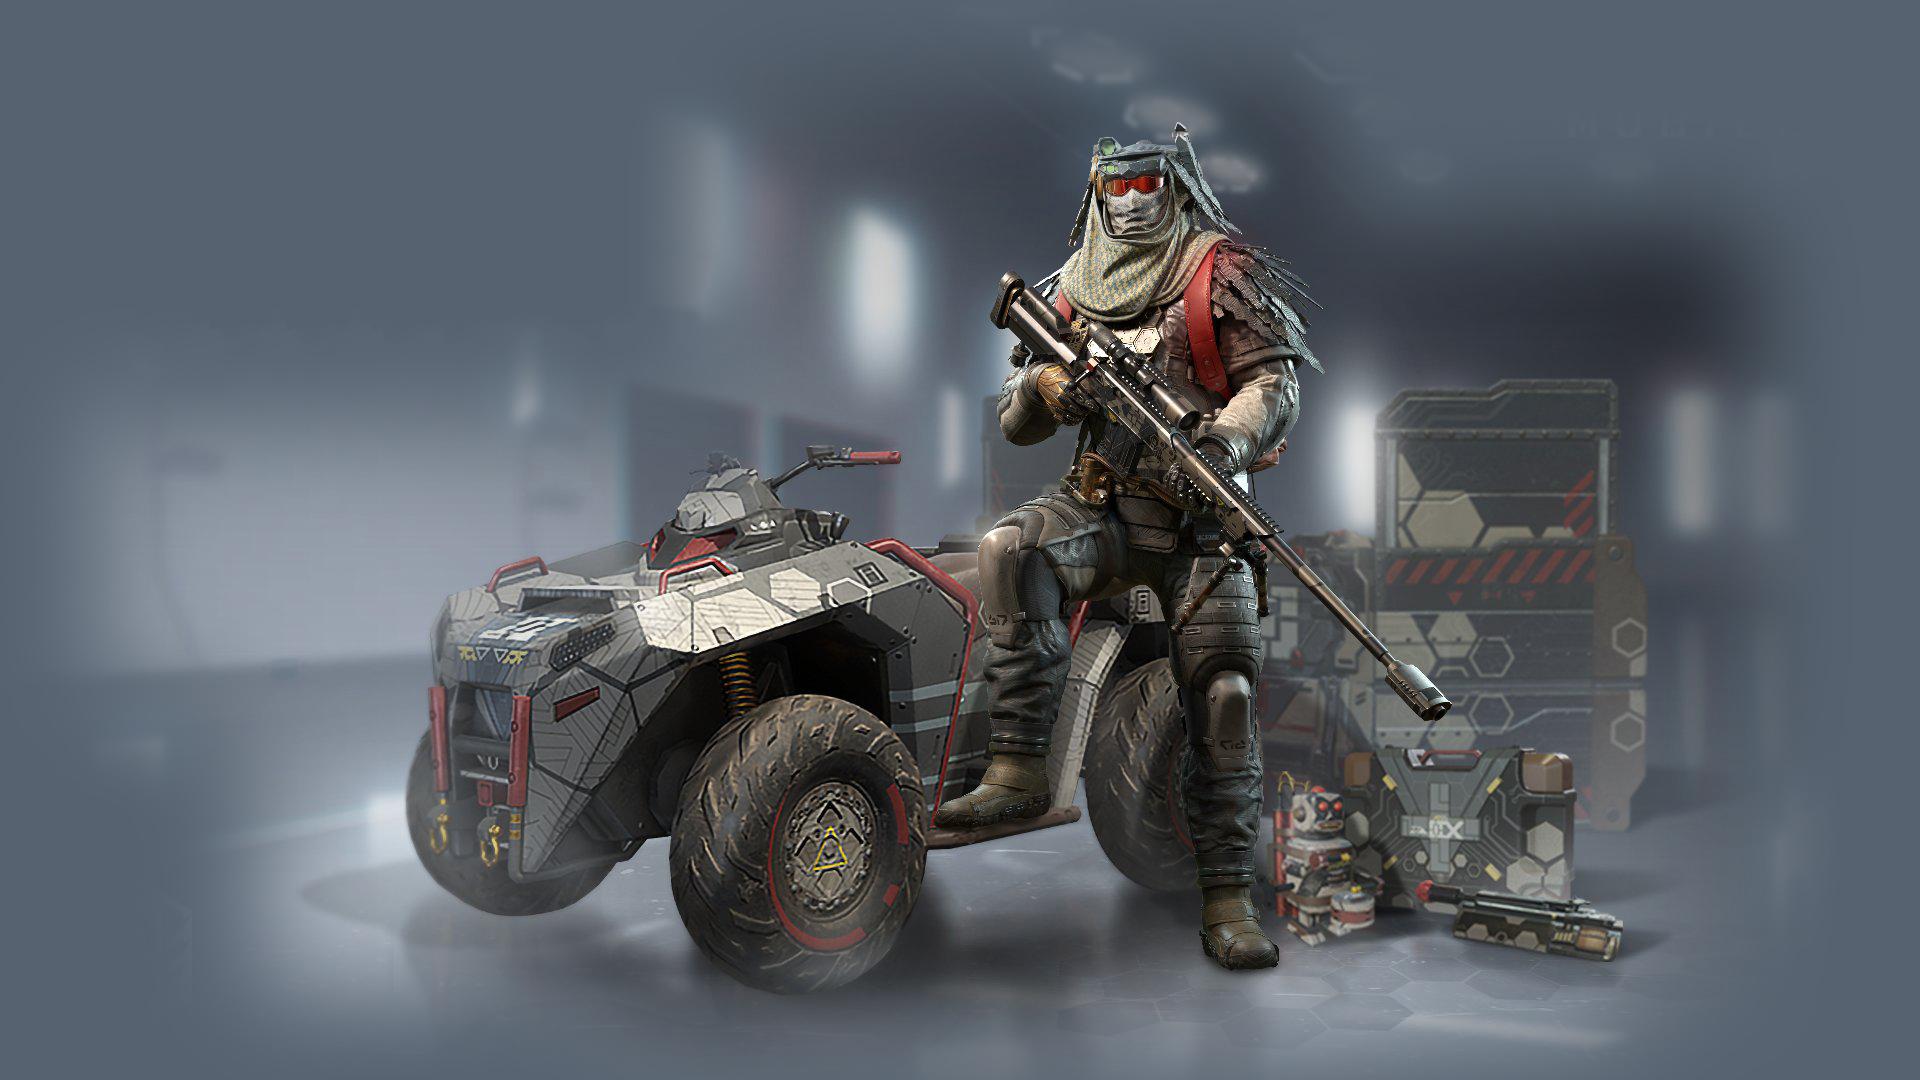 Call Of Duty Mobile Season 3 Wallpaper Hd Games 4k Wallpapers